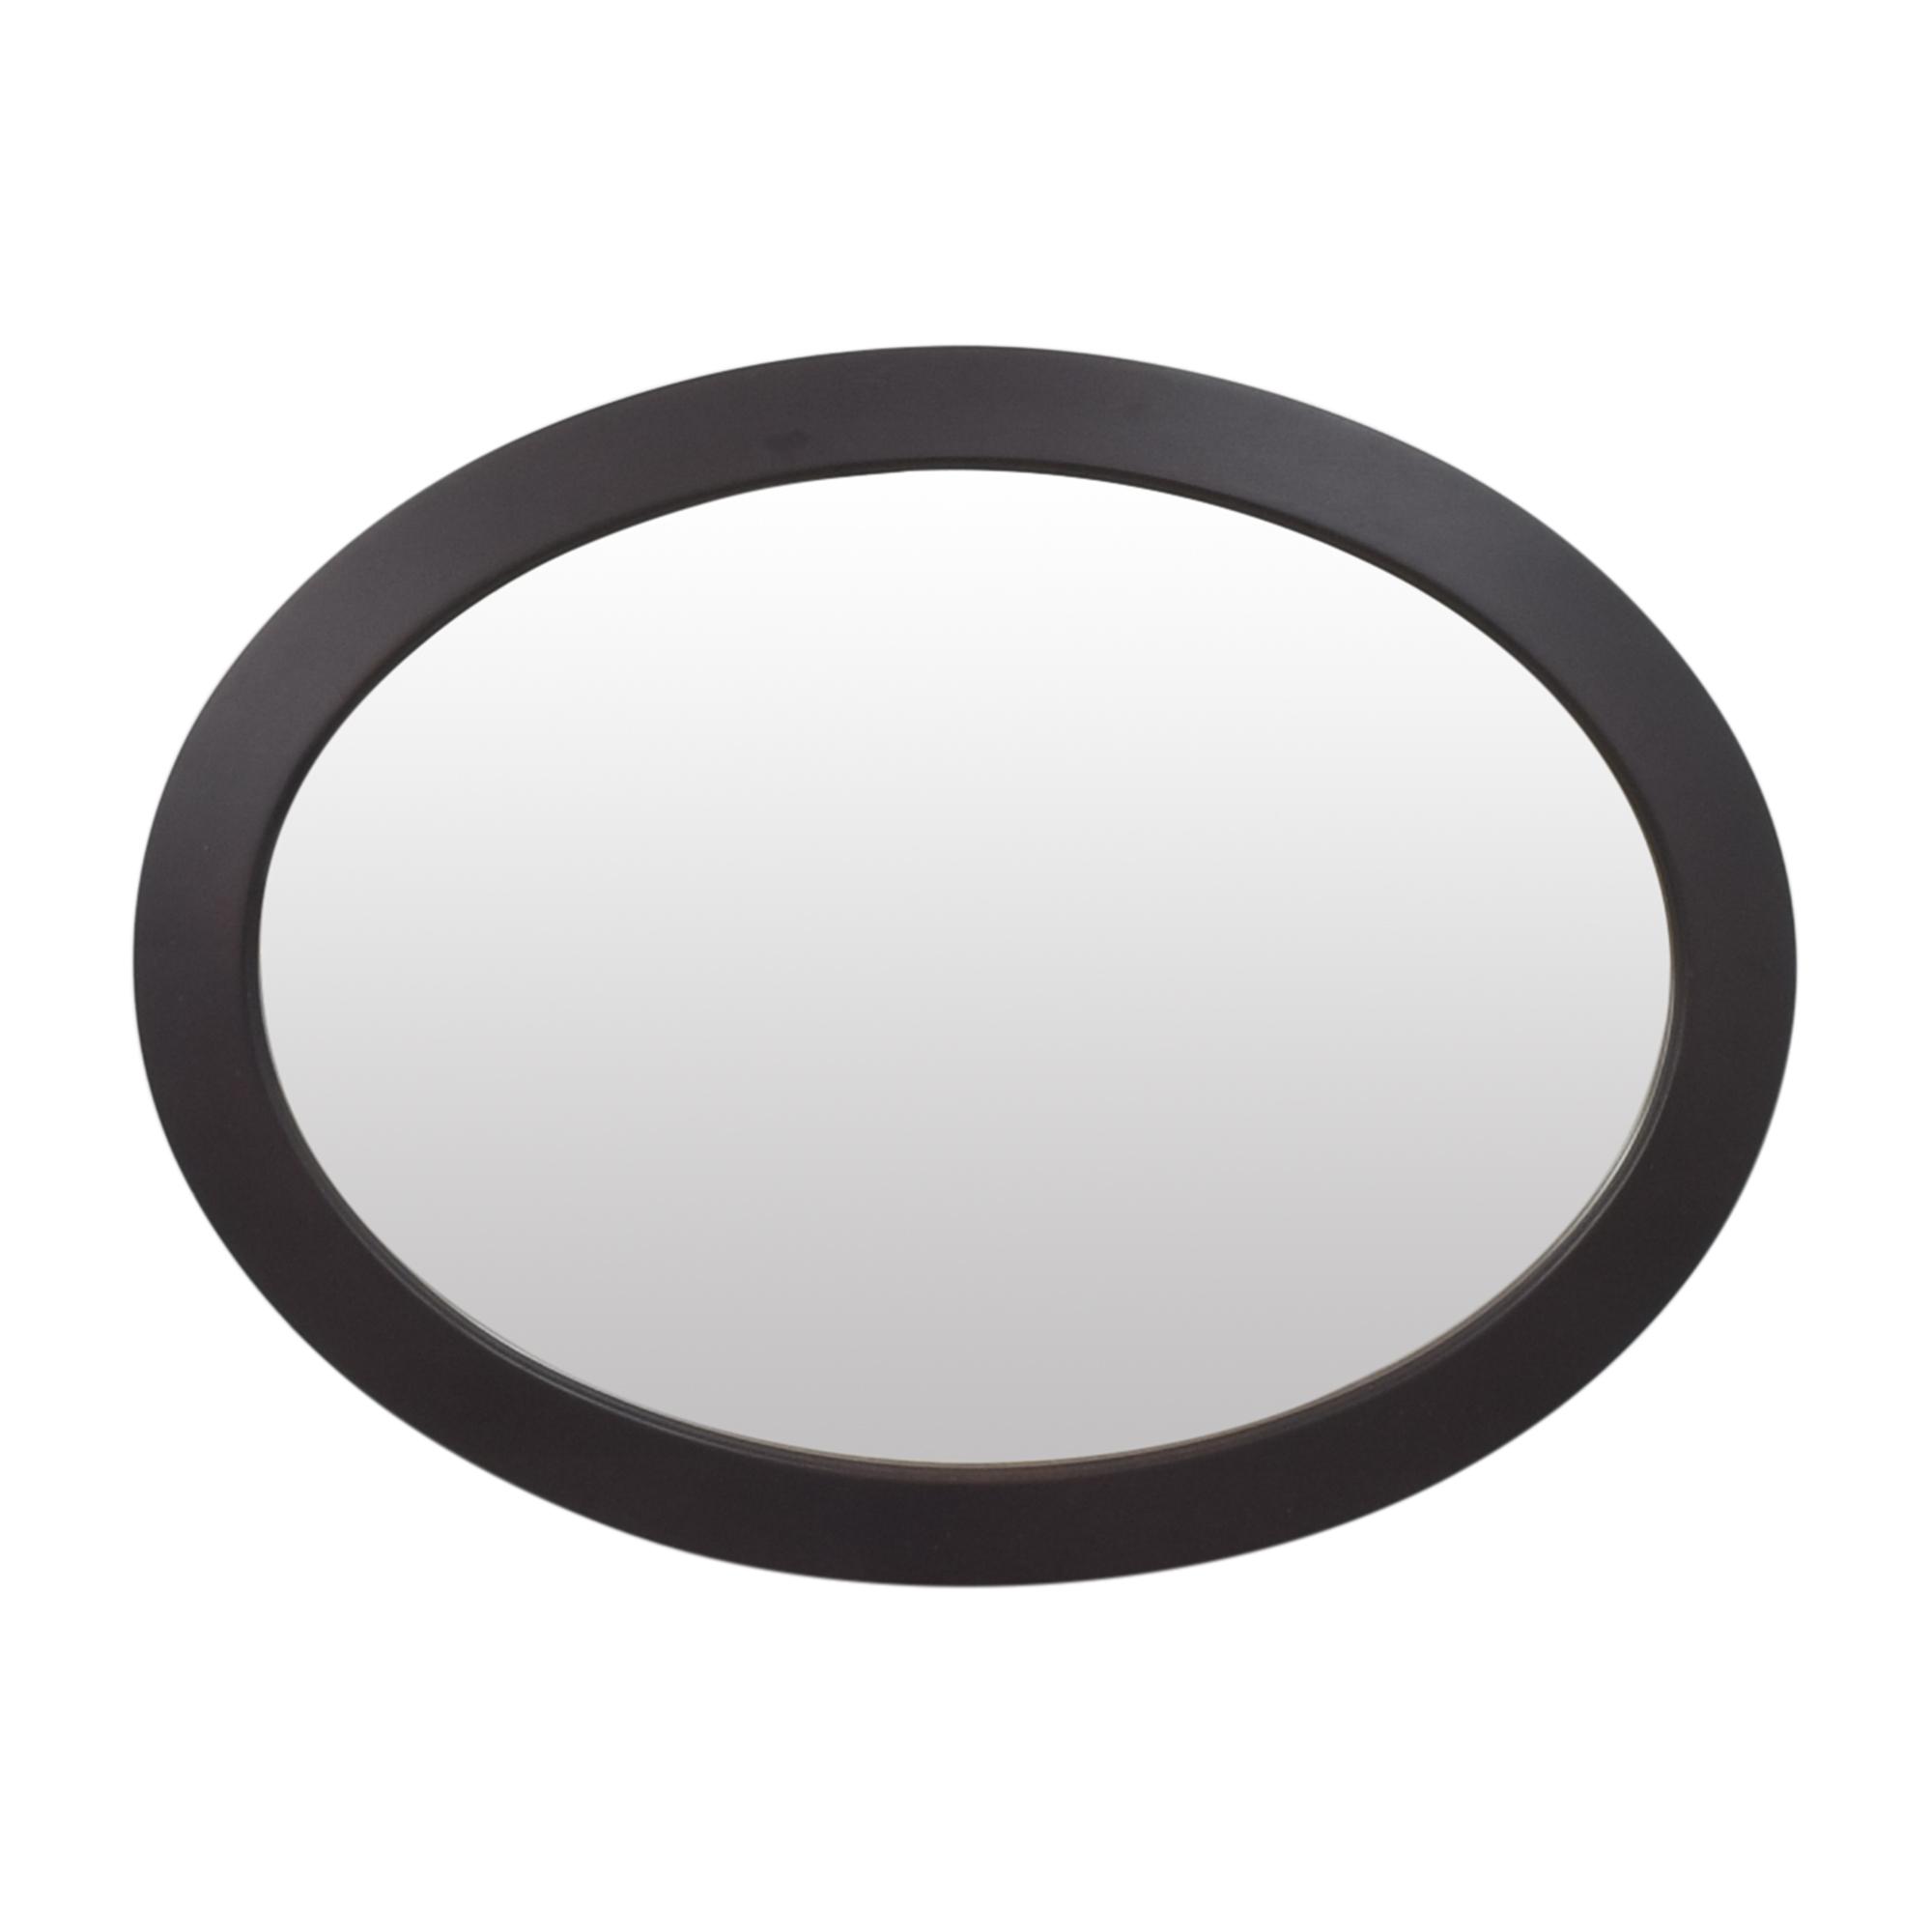 Shermag Shermag Oval Wall Mirror ma